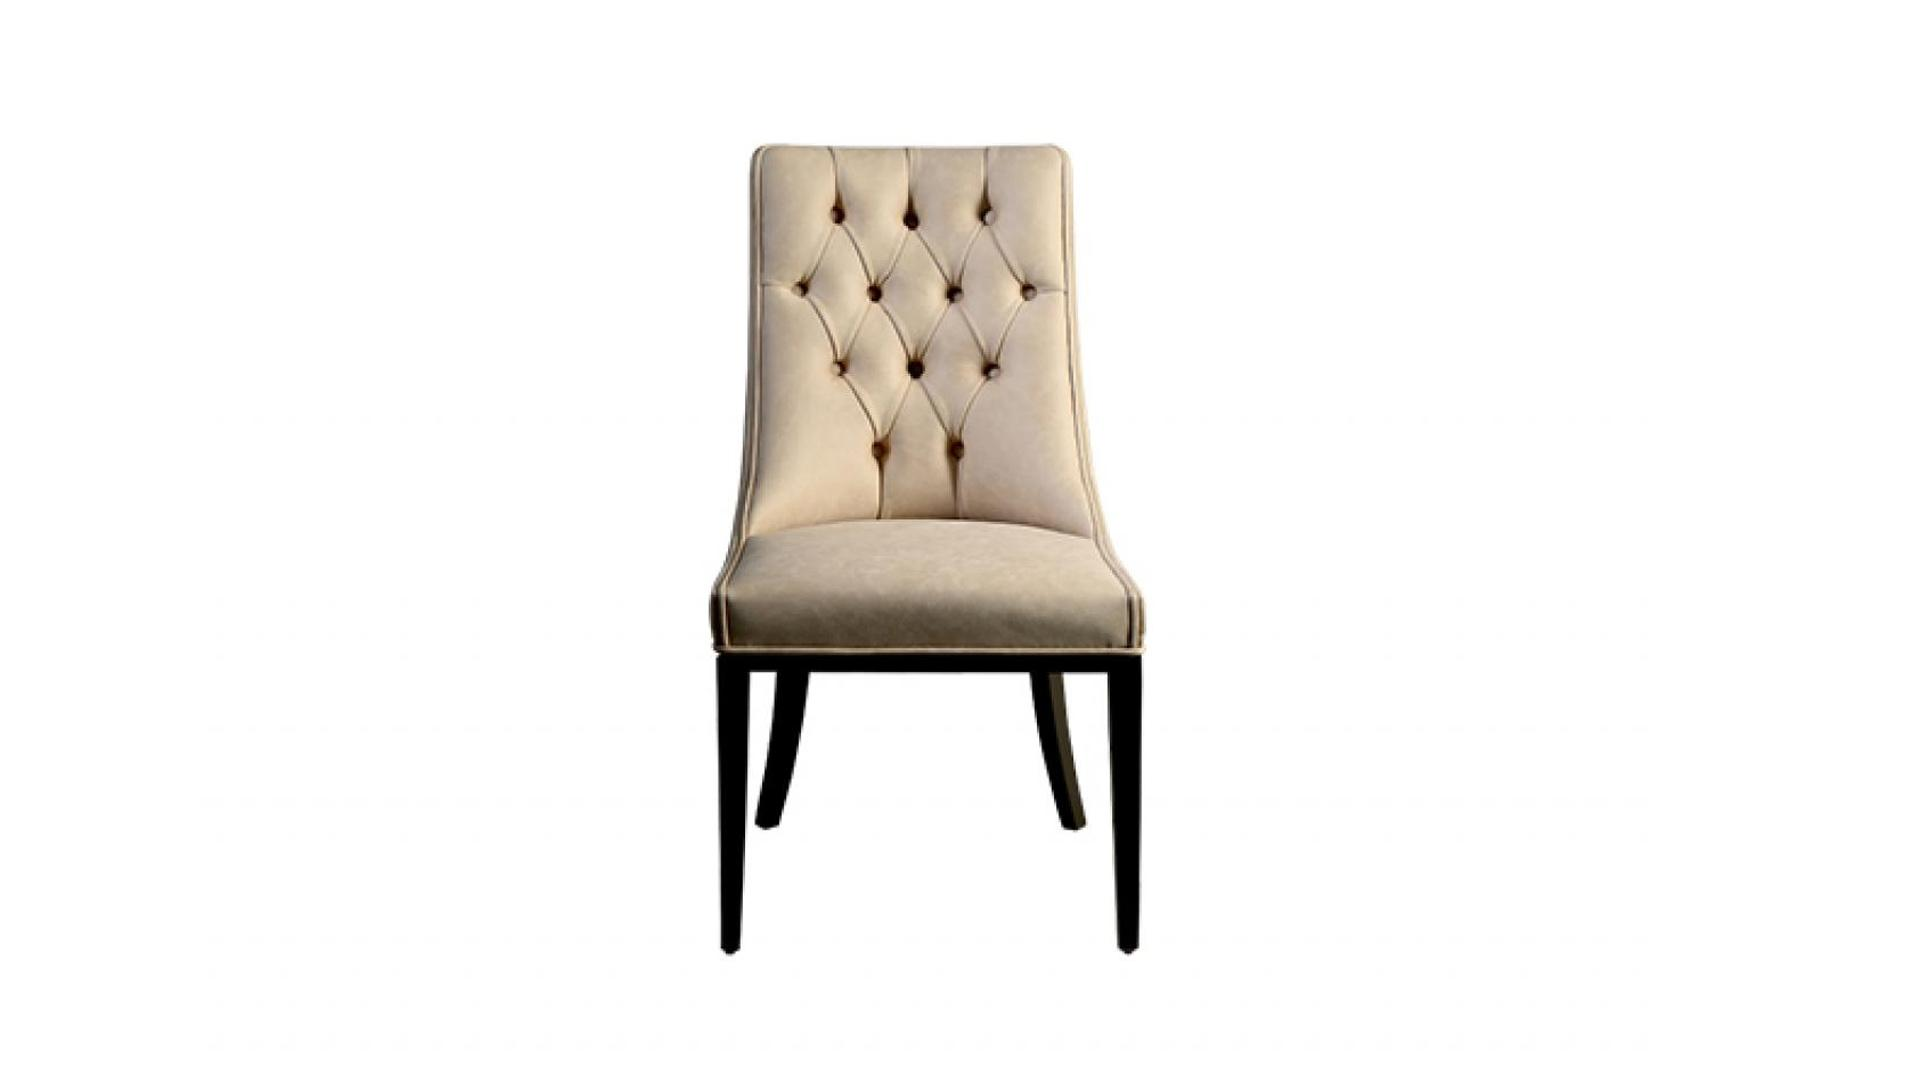 335 Sandalye